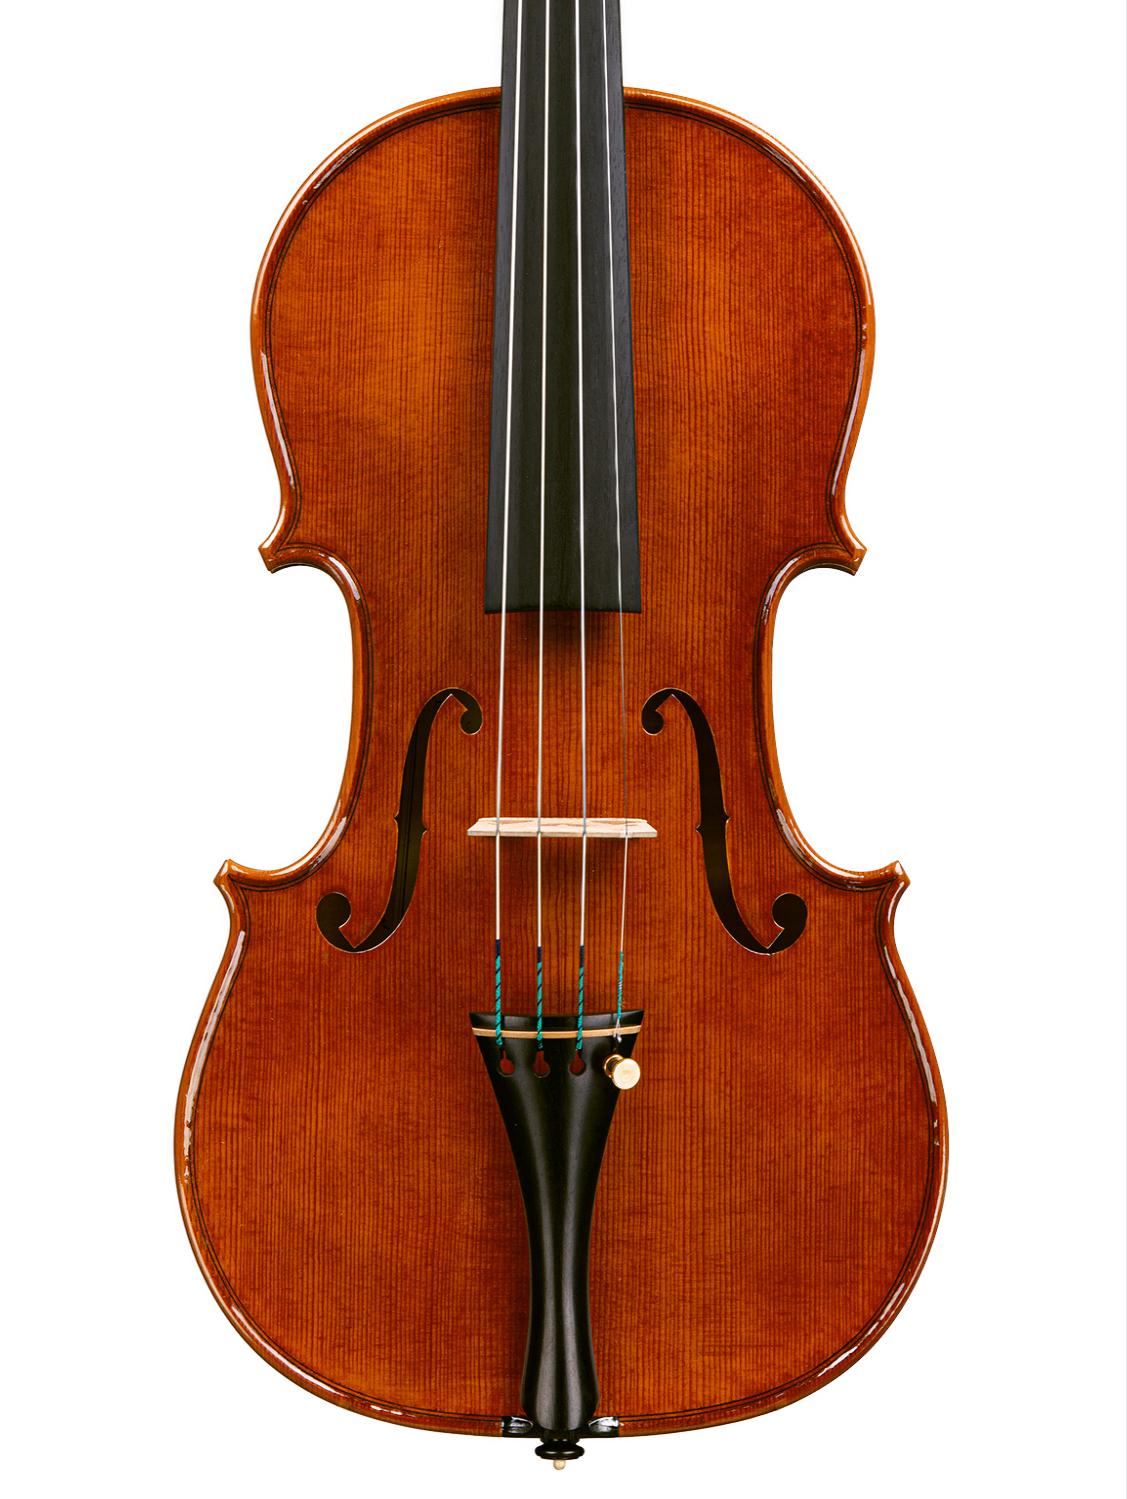 Violin by Marco Cargnelutti, 2020